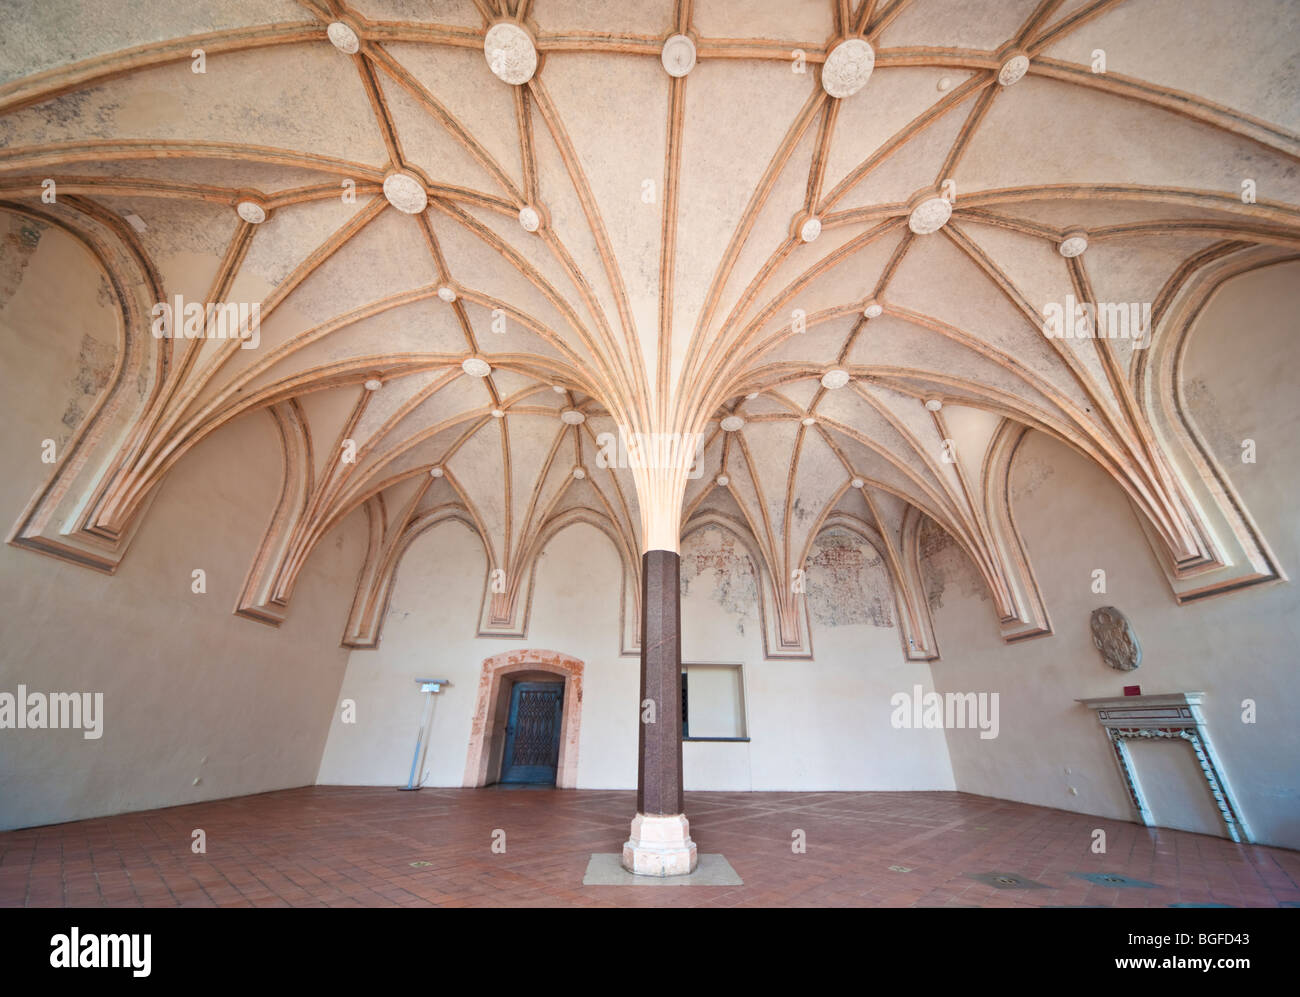 Room with cross vault ceiling in Teutonic Knights castle Malbork, Nogat River, Pomerania, Poland | Marienburg, Ordensburg, - Stock Image